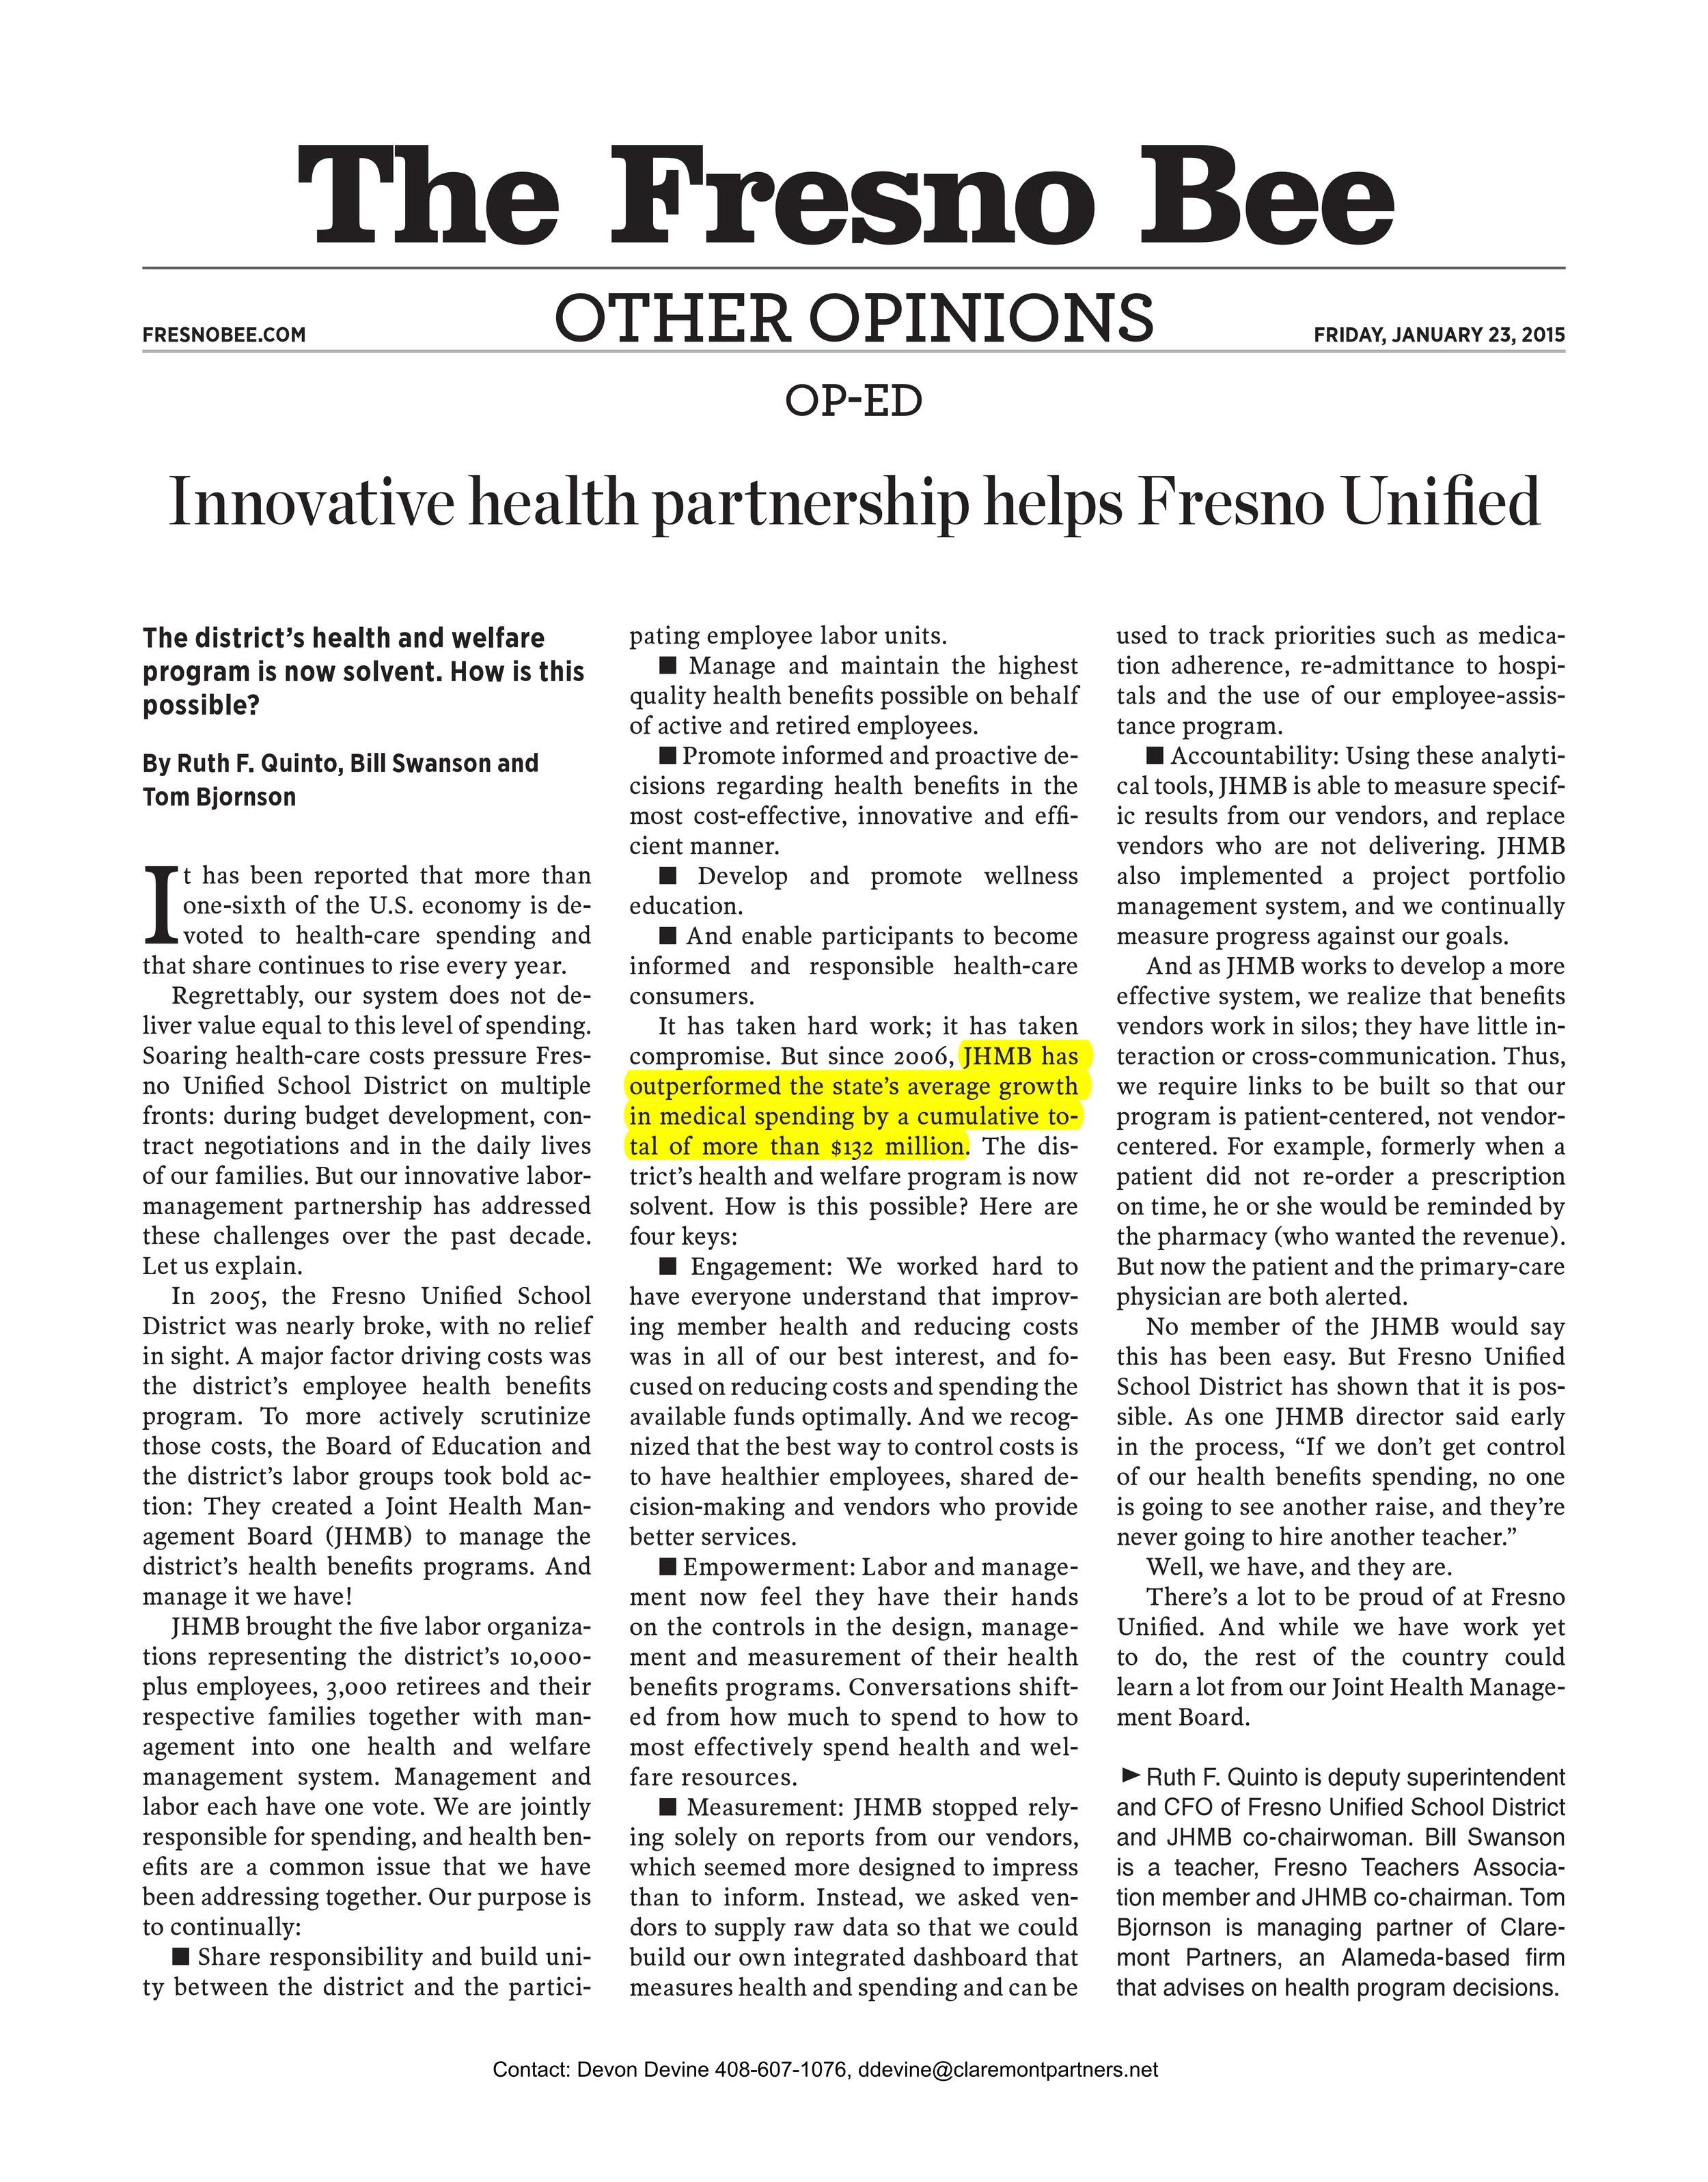 Innovative health partnership